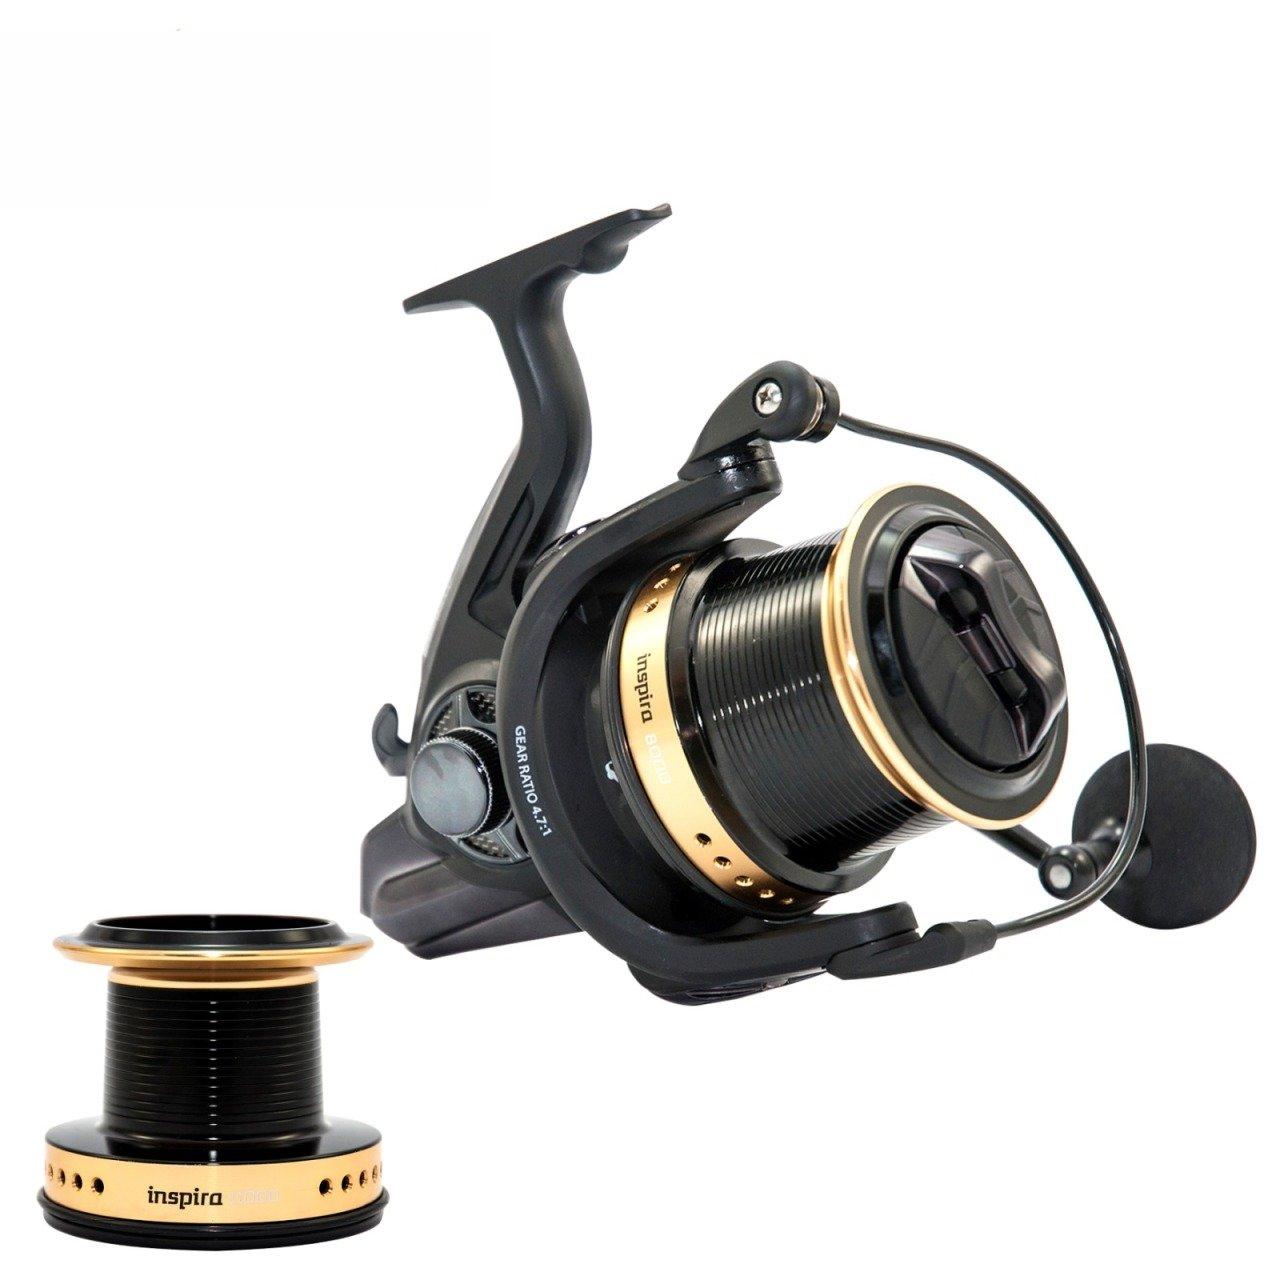 Carreto Vega Inspira 8000 1 Pesca Barrento